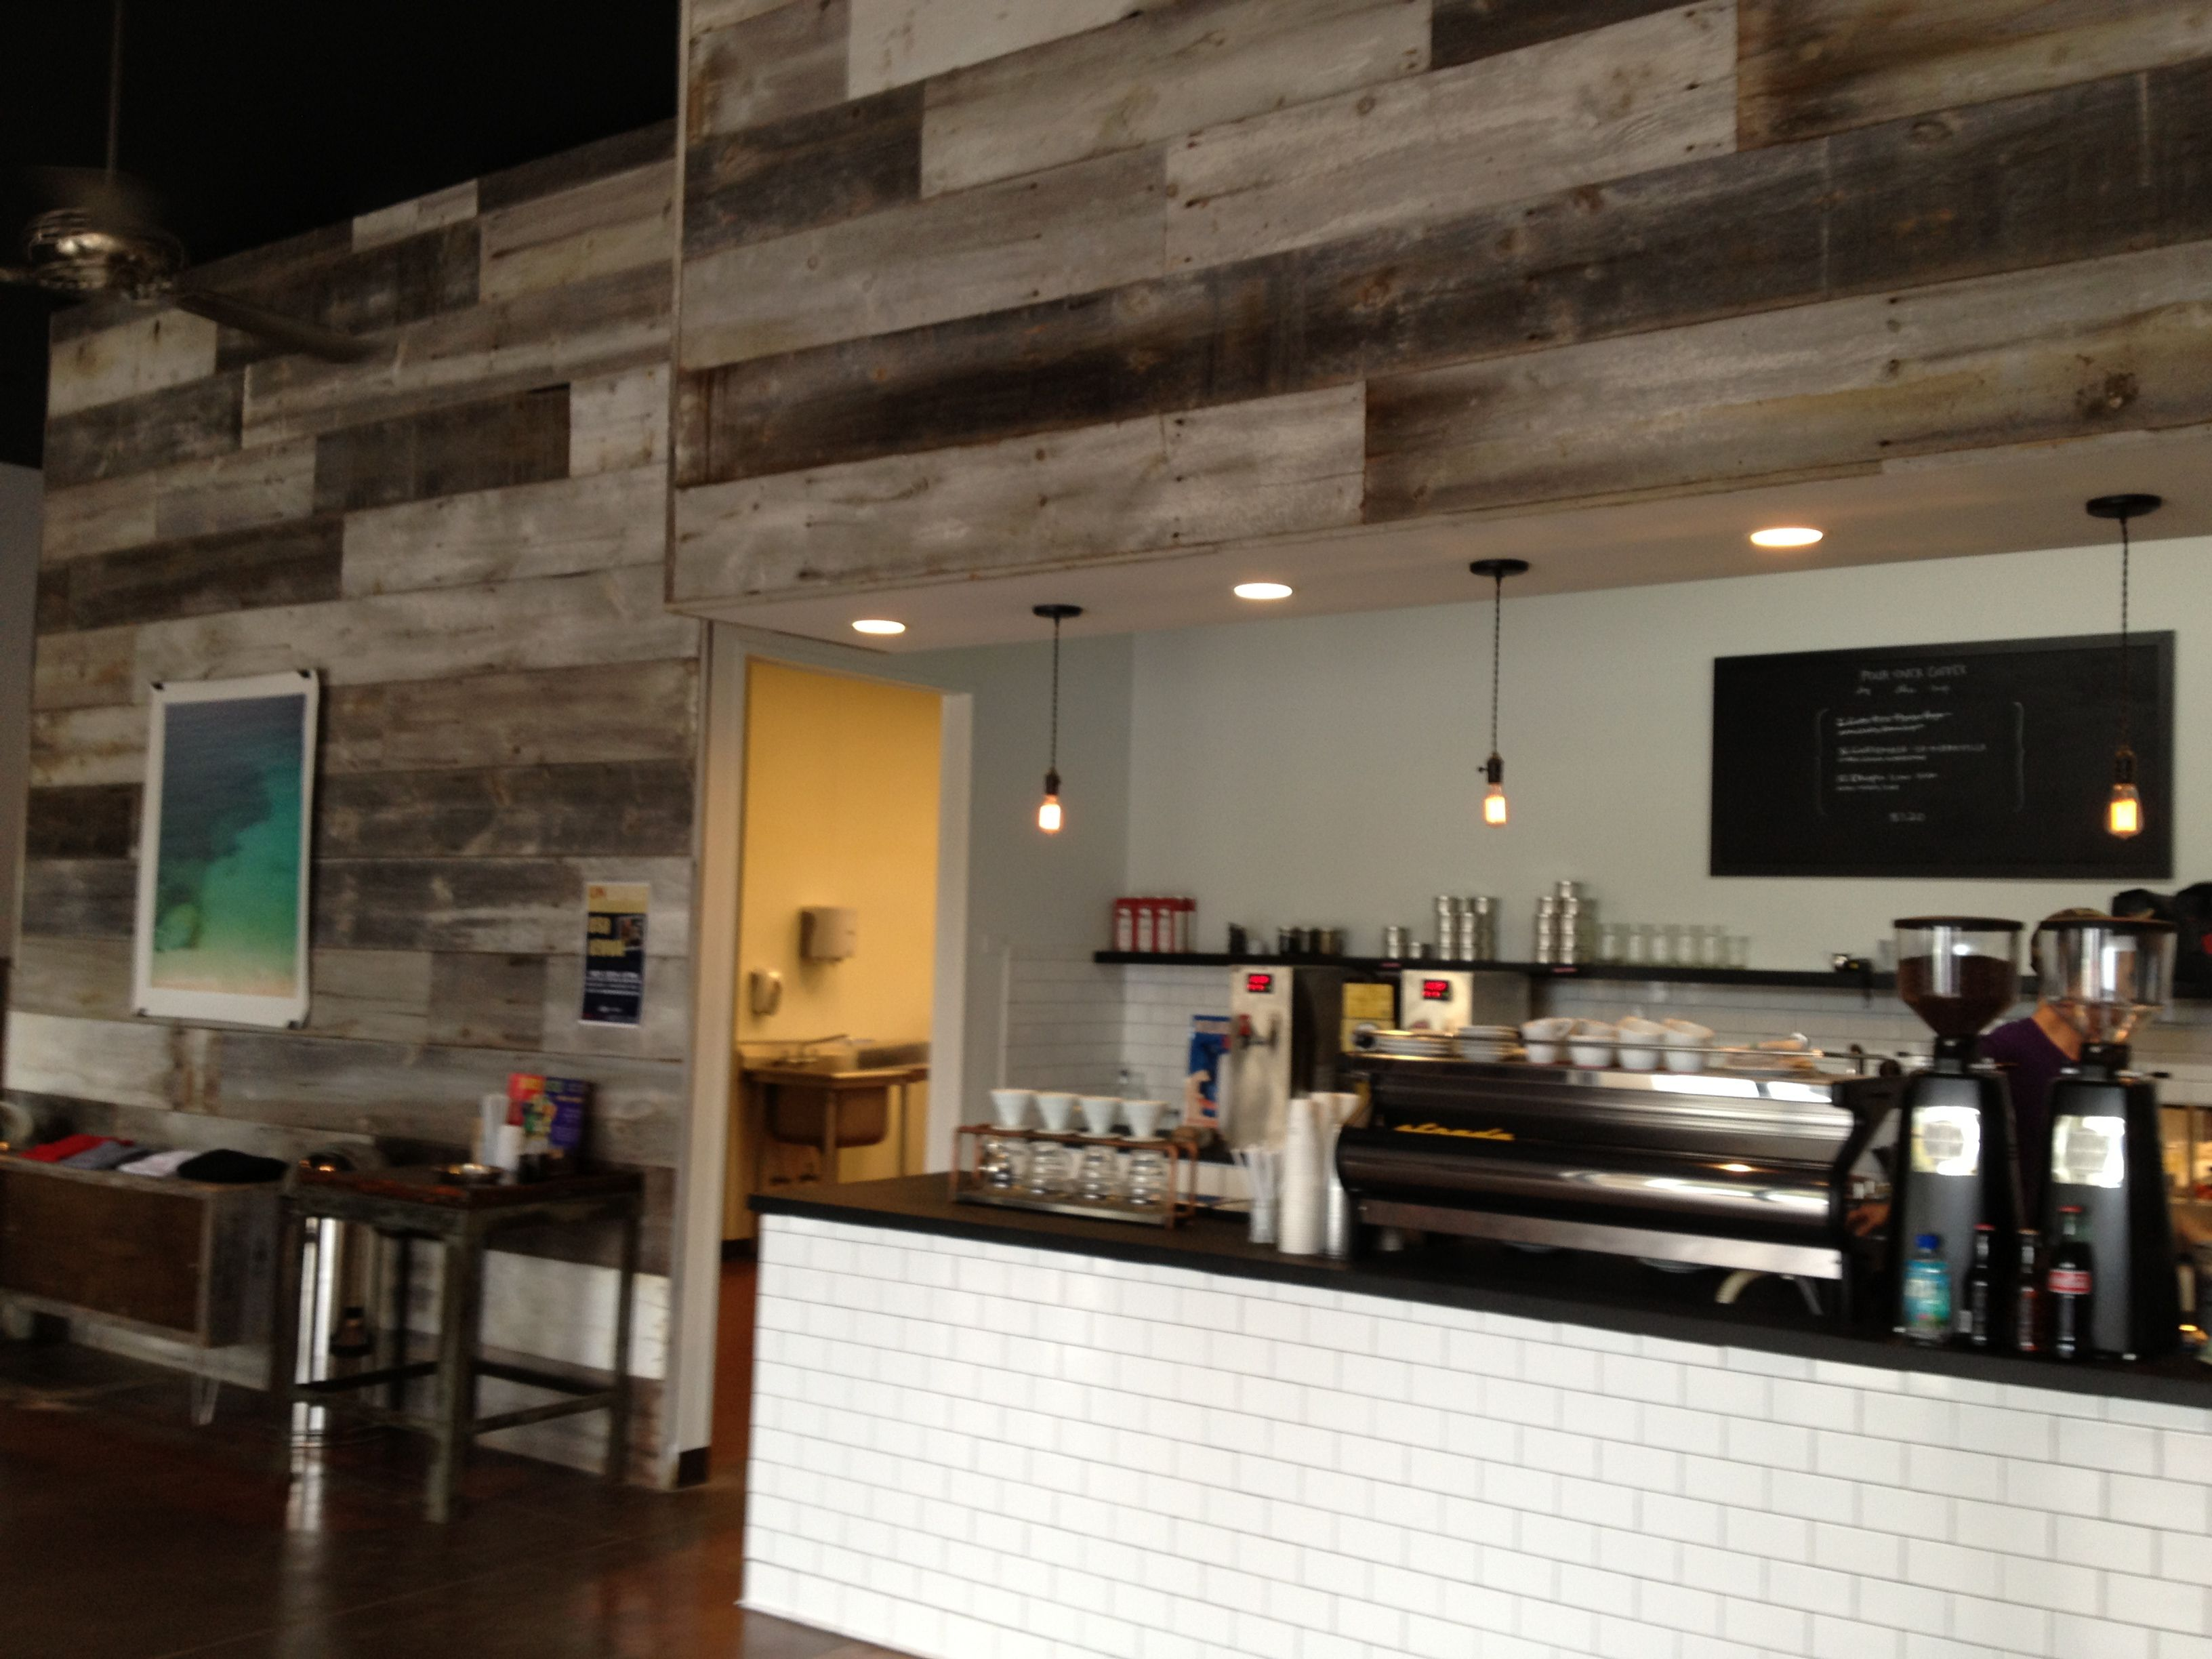 Barn Board Walls At The Collective Coffee Company In Mt Pleasant, SC